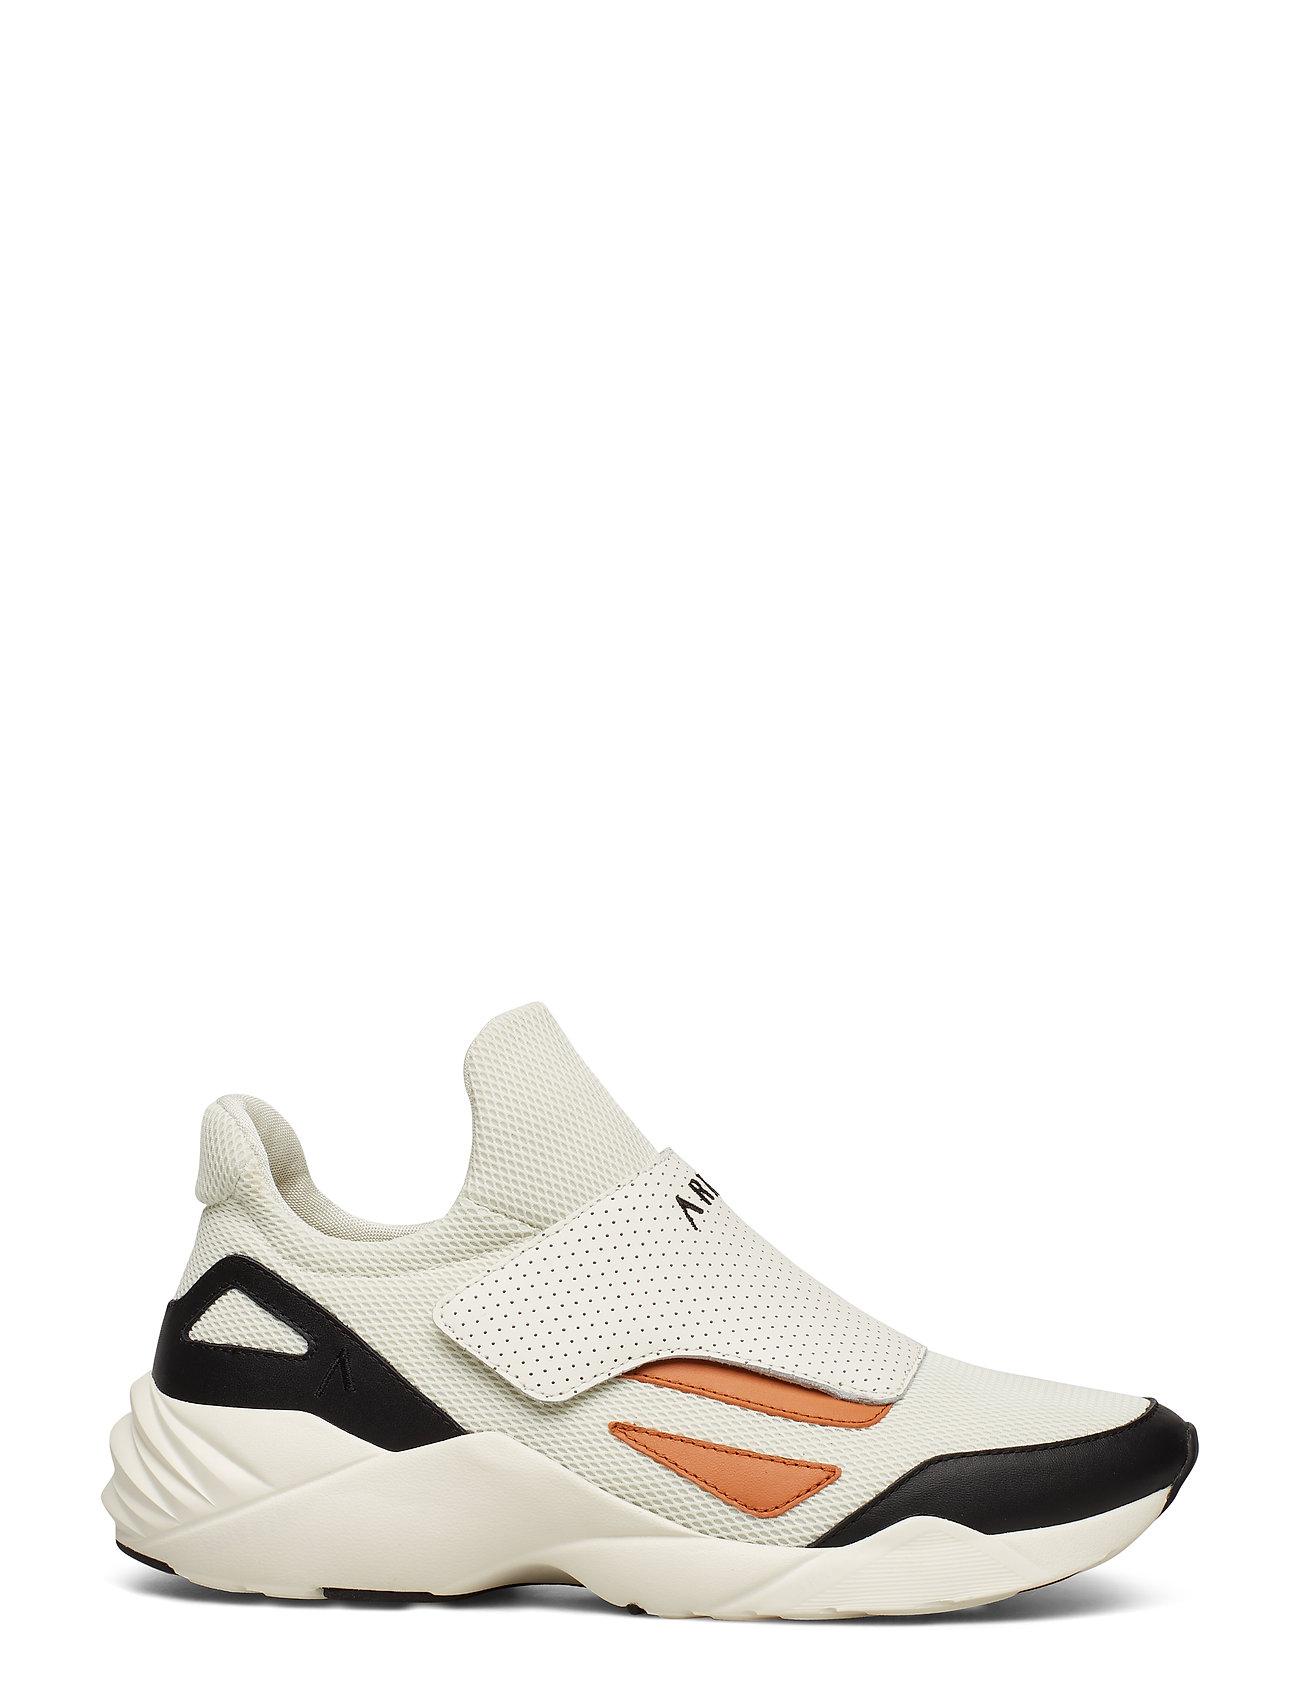 Apextron Mesh W13 Off White Caramel Low top Sneakers Creme ARKK Copenhagen